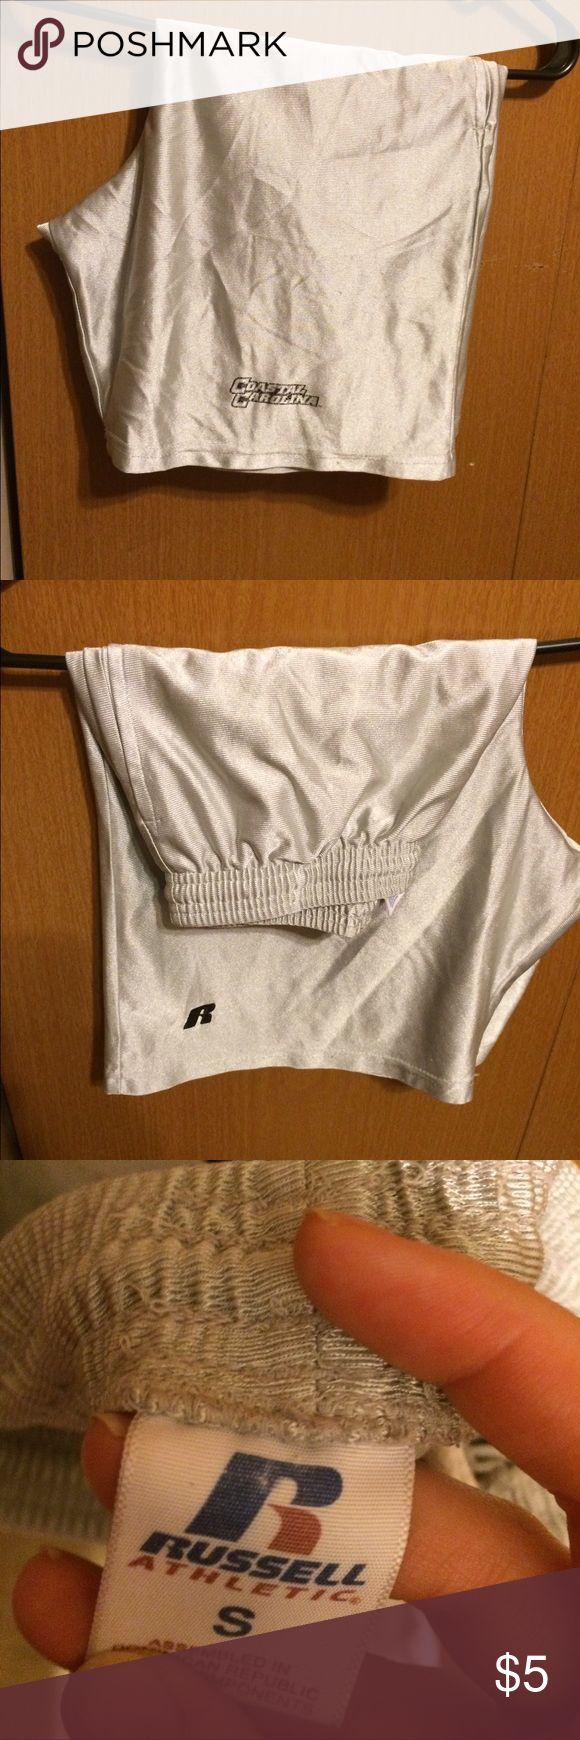 Coastal Carolina University Basketball shorts Basketball shorts with pockets on each side. Russell Athletic Shorts